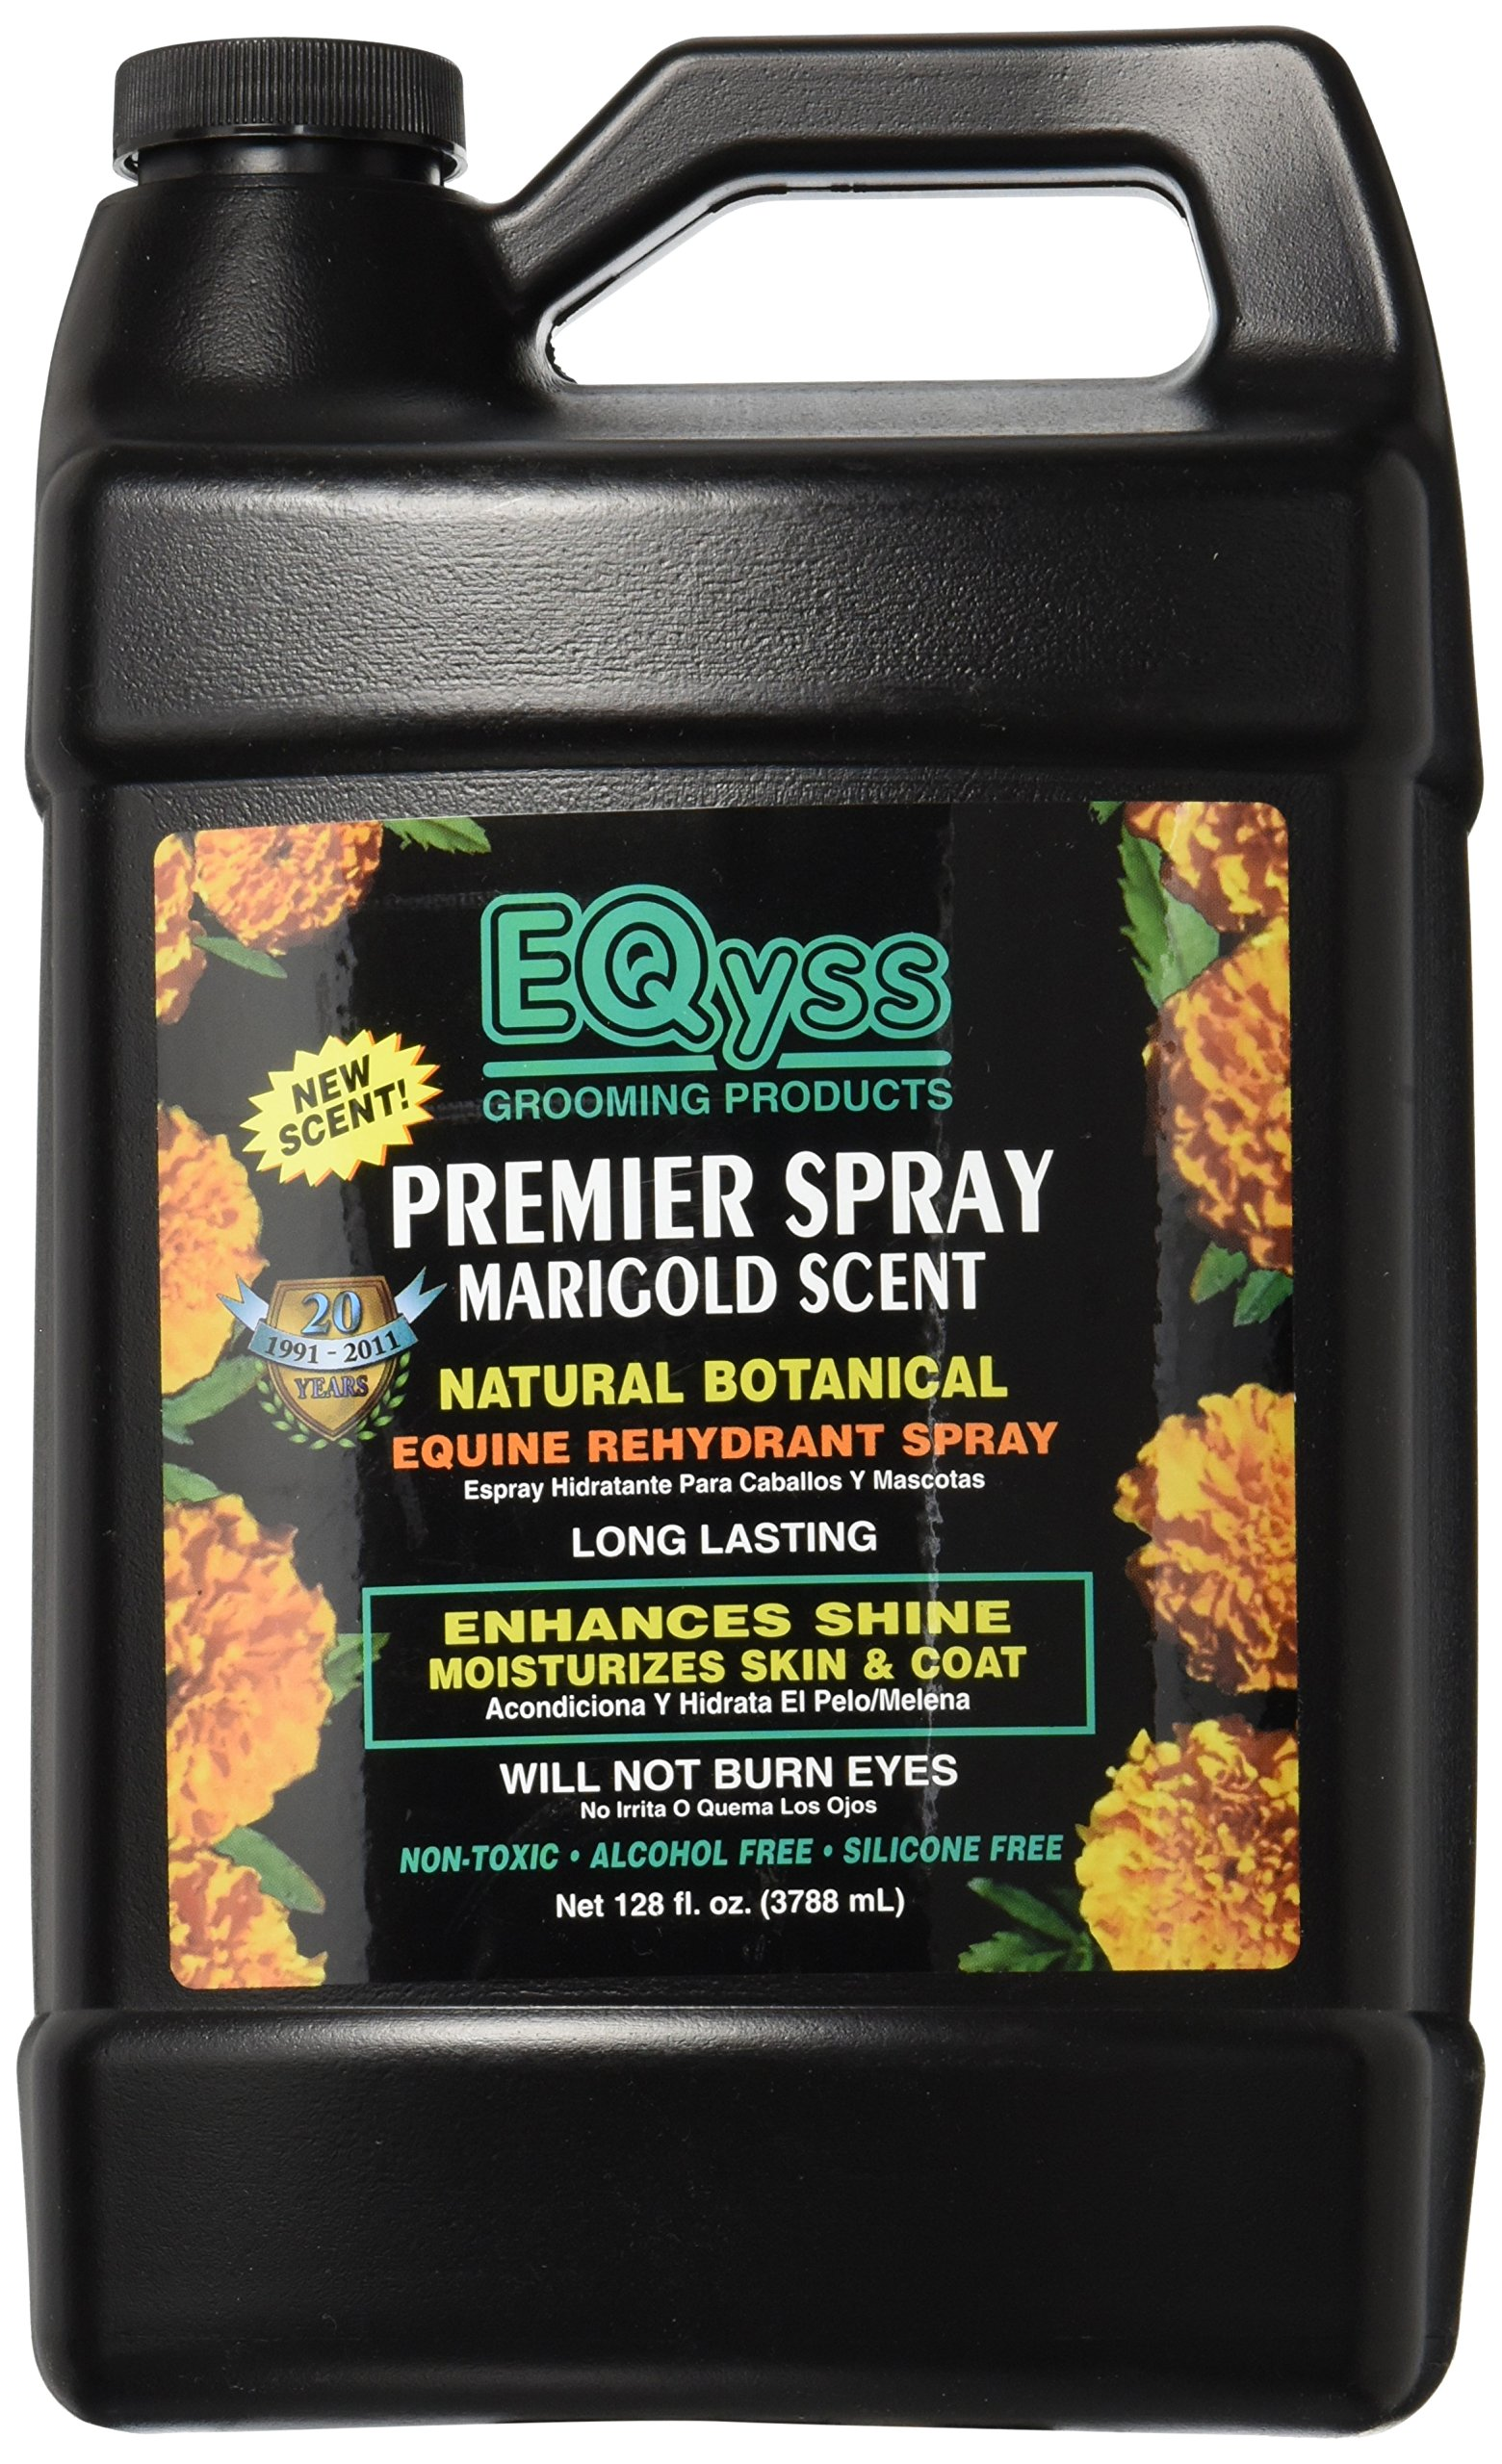 EQyss Premier Spray Marigold Scent 128 oz